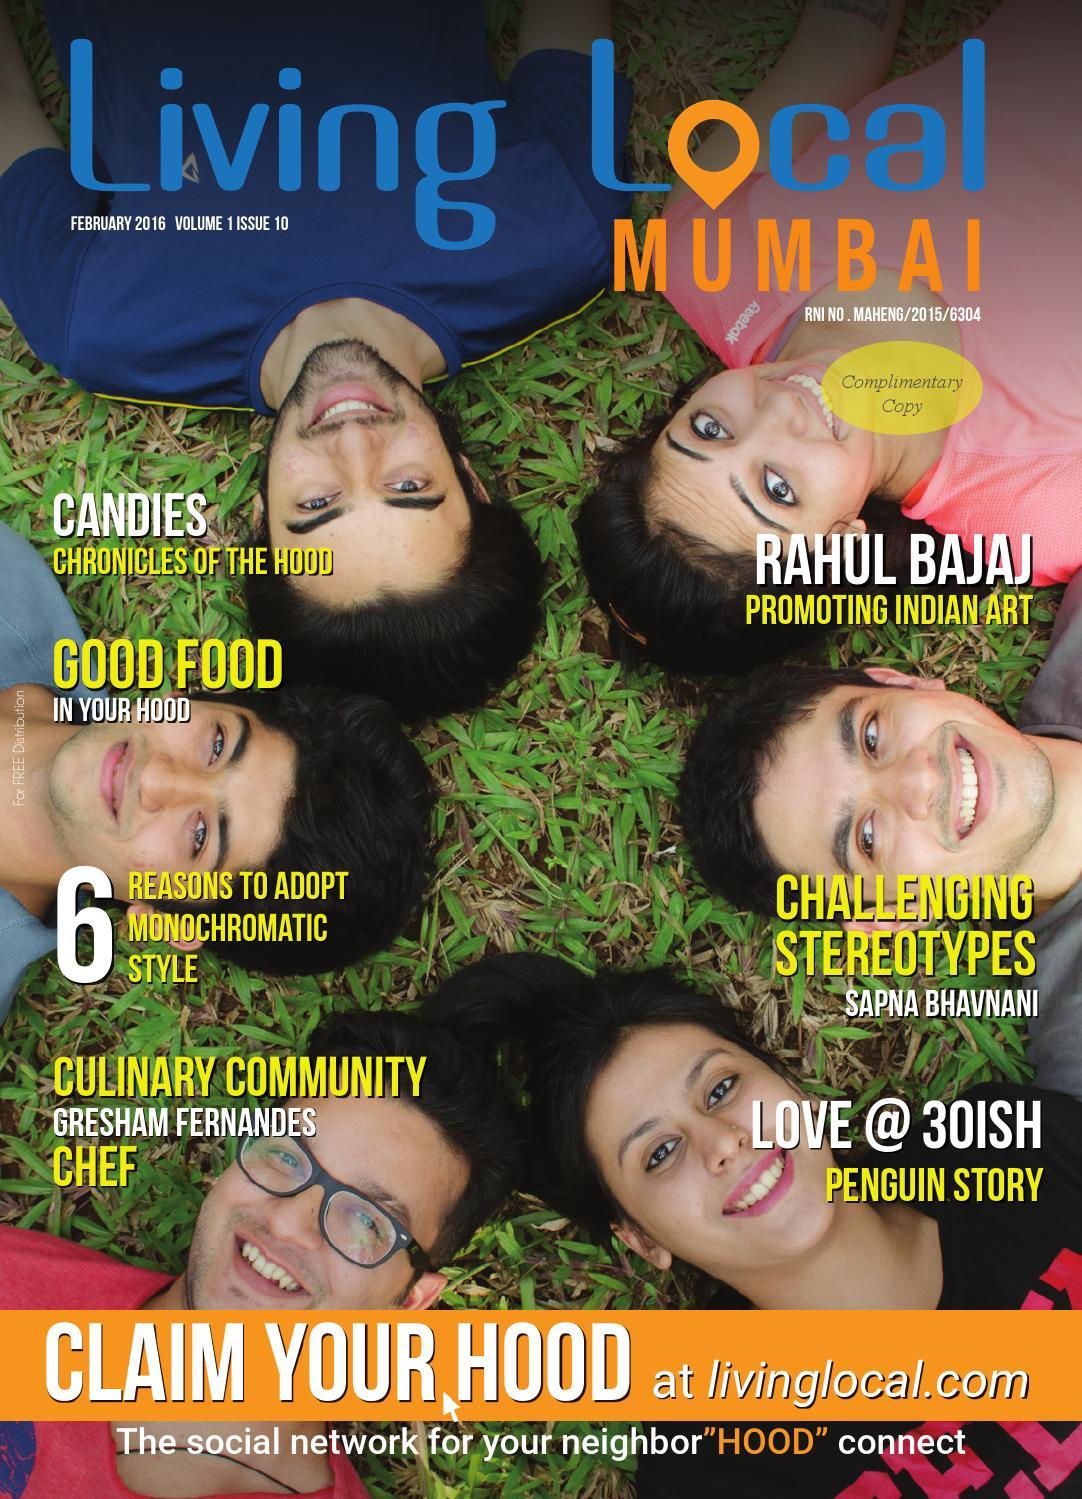 Living Local Mumbai (Bandra-Khar Edition) by Living Local Mumbai - issuu